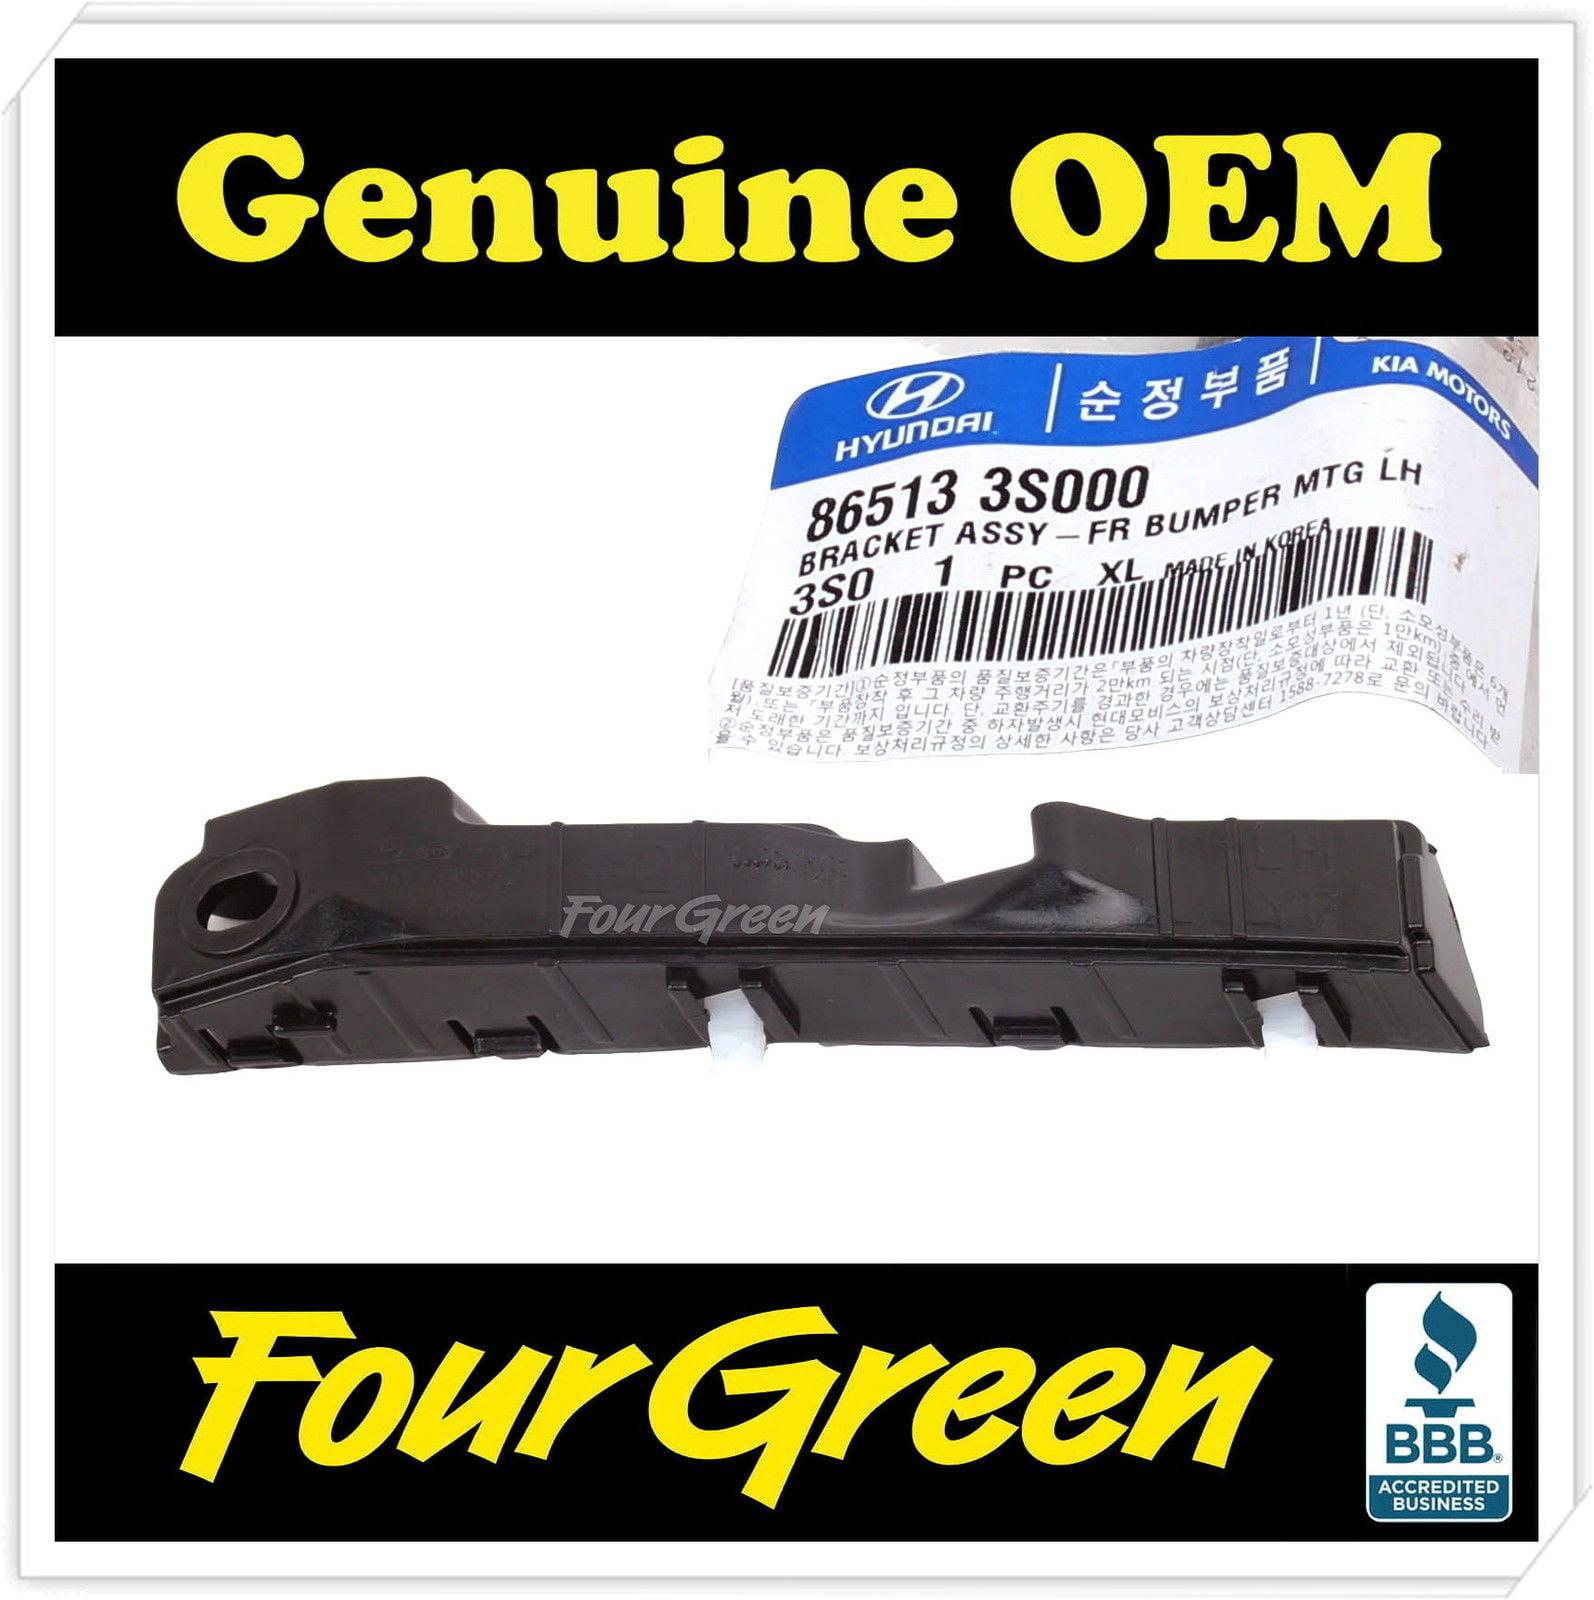 Genuine Front left side bumper bracket for Sonata 2011-2014 OEM [865133S000]